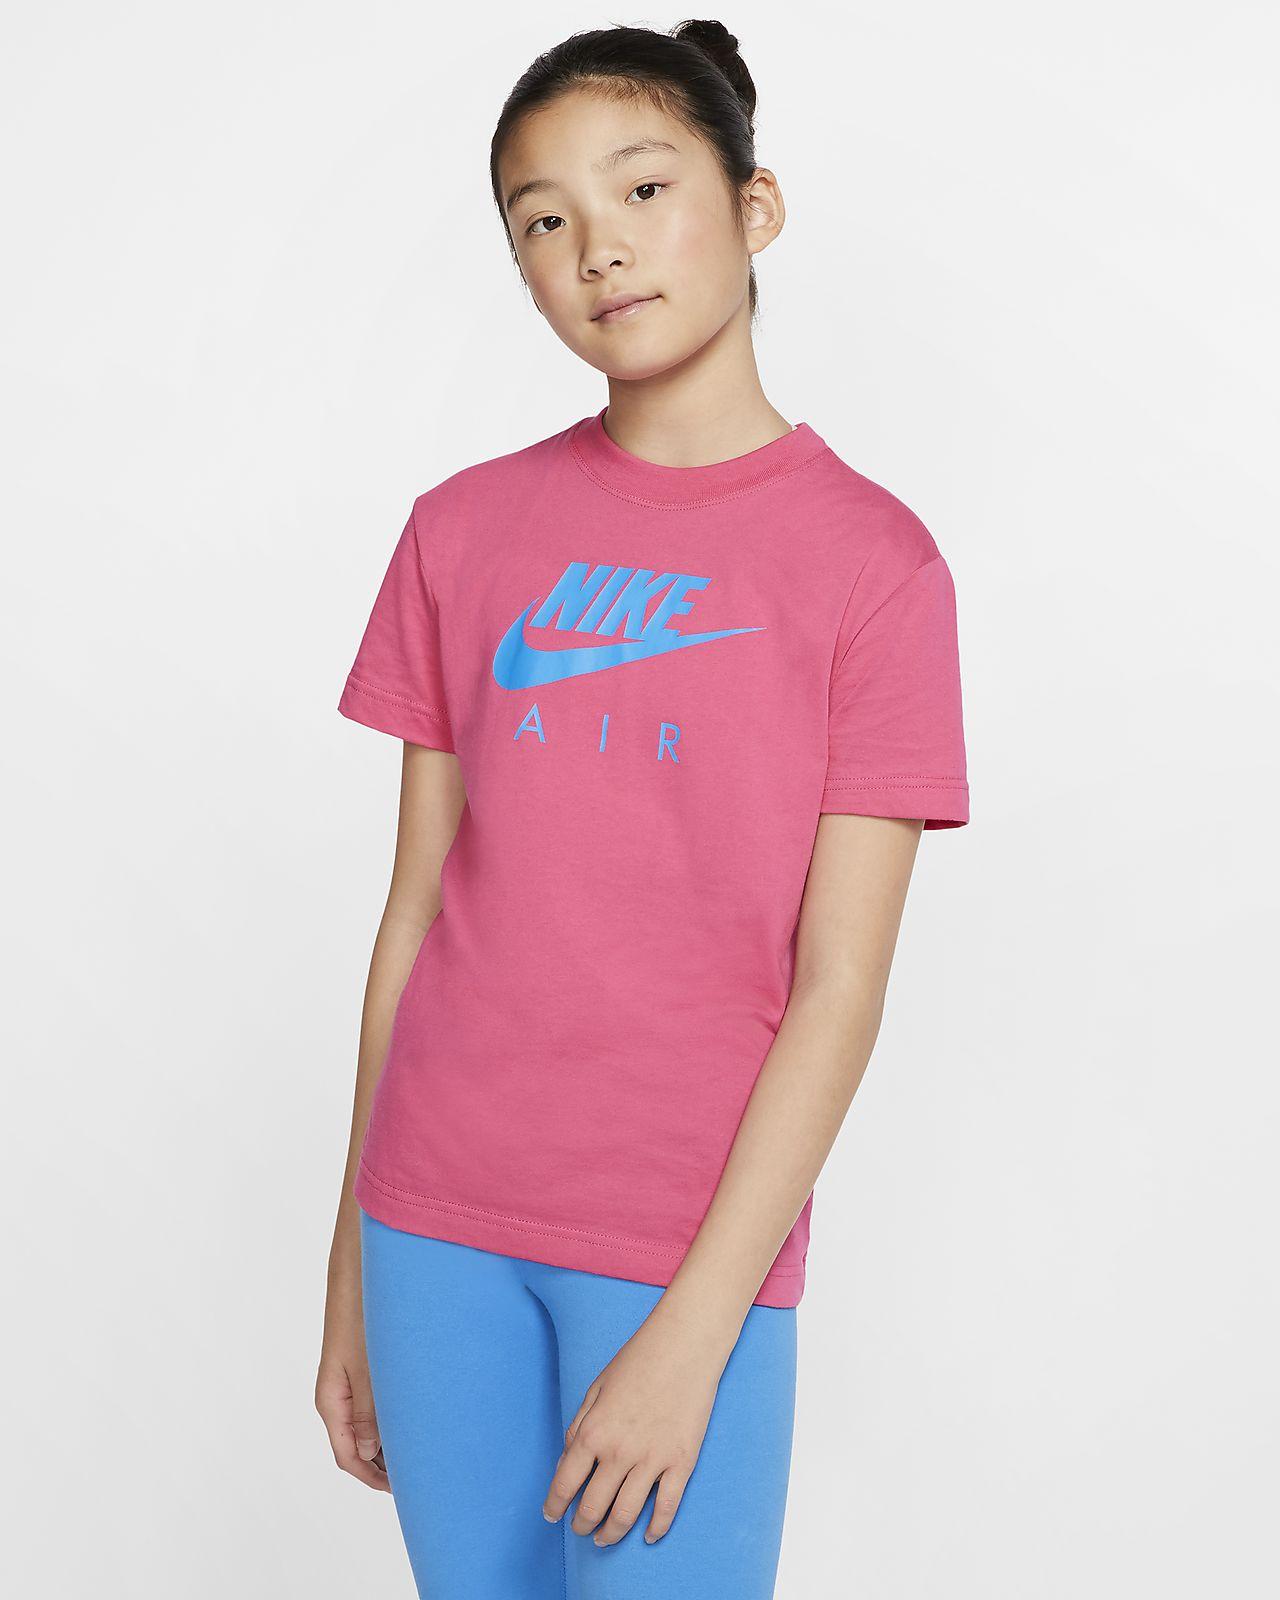 Nike Air Big Kids' (Girls') Cotton T-Shirt